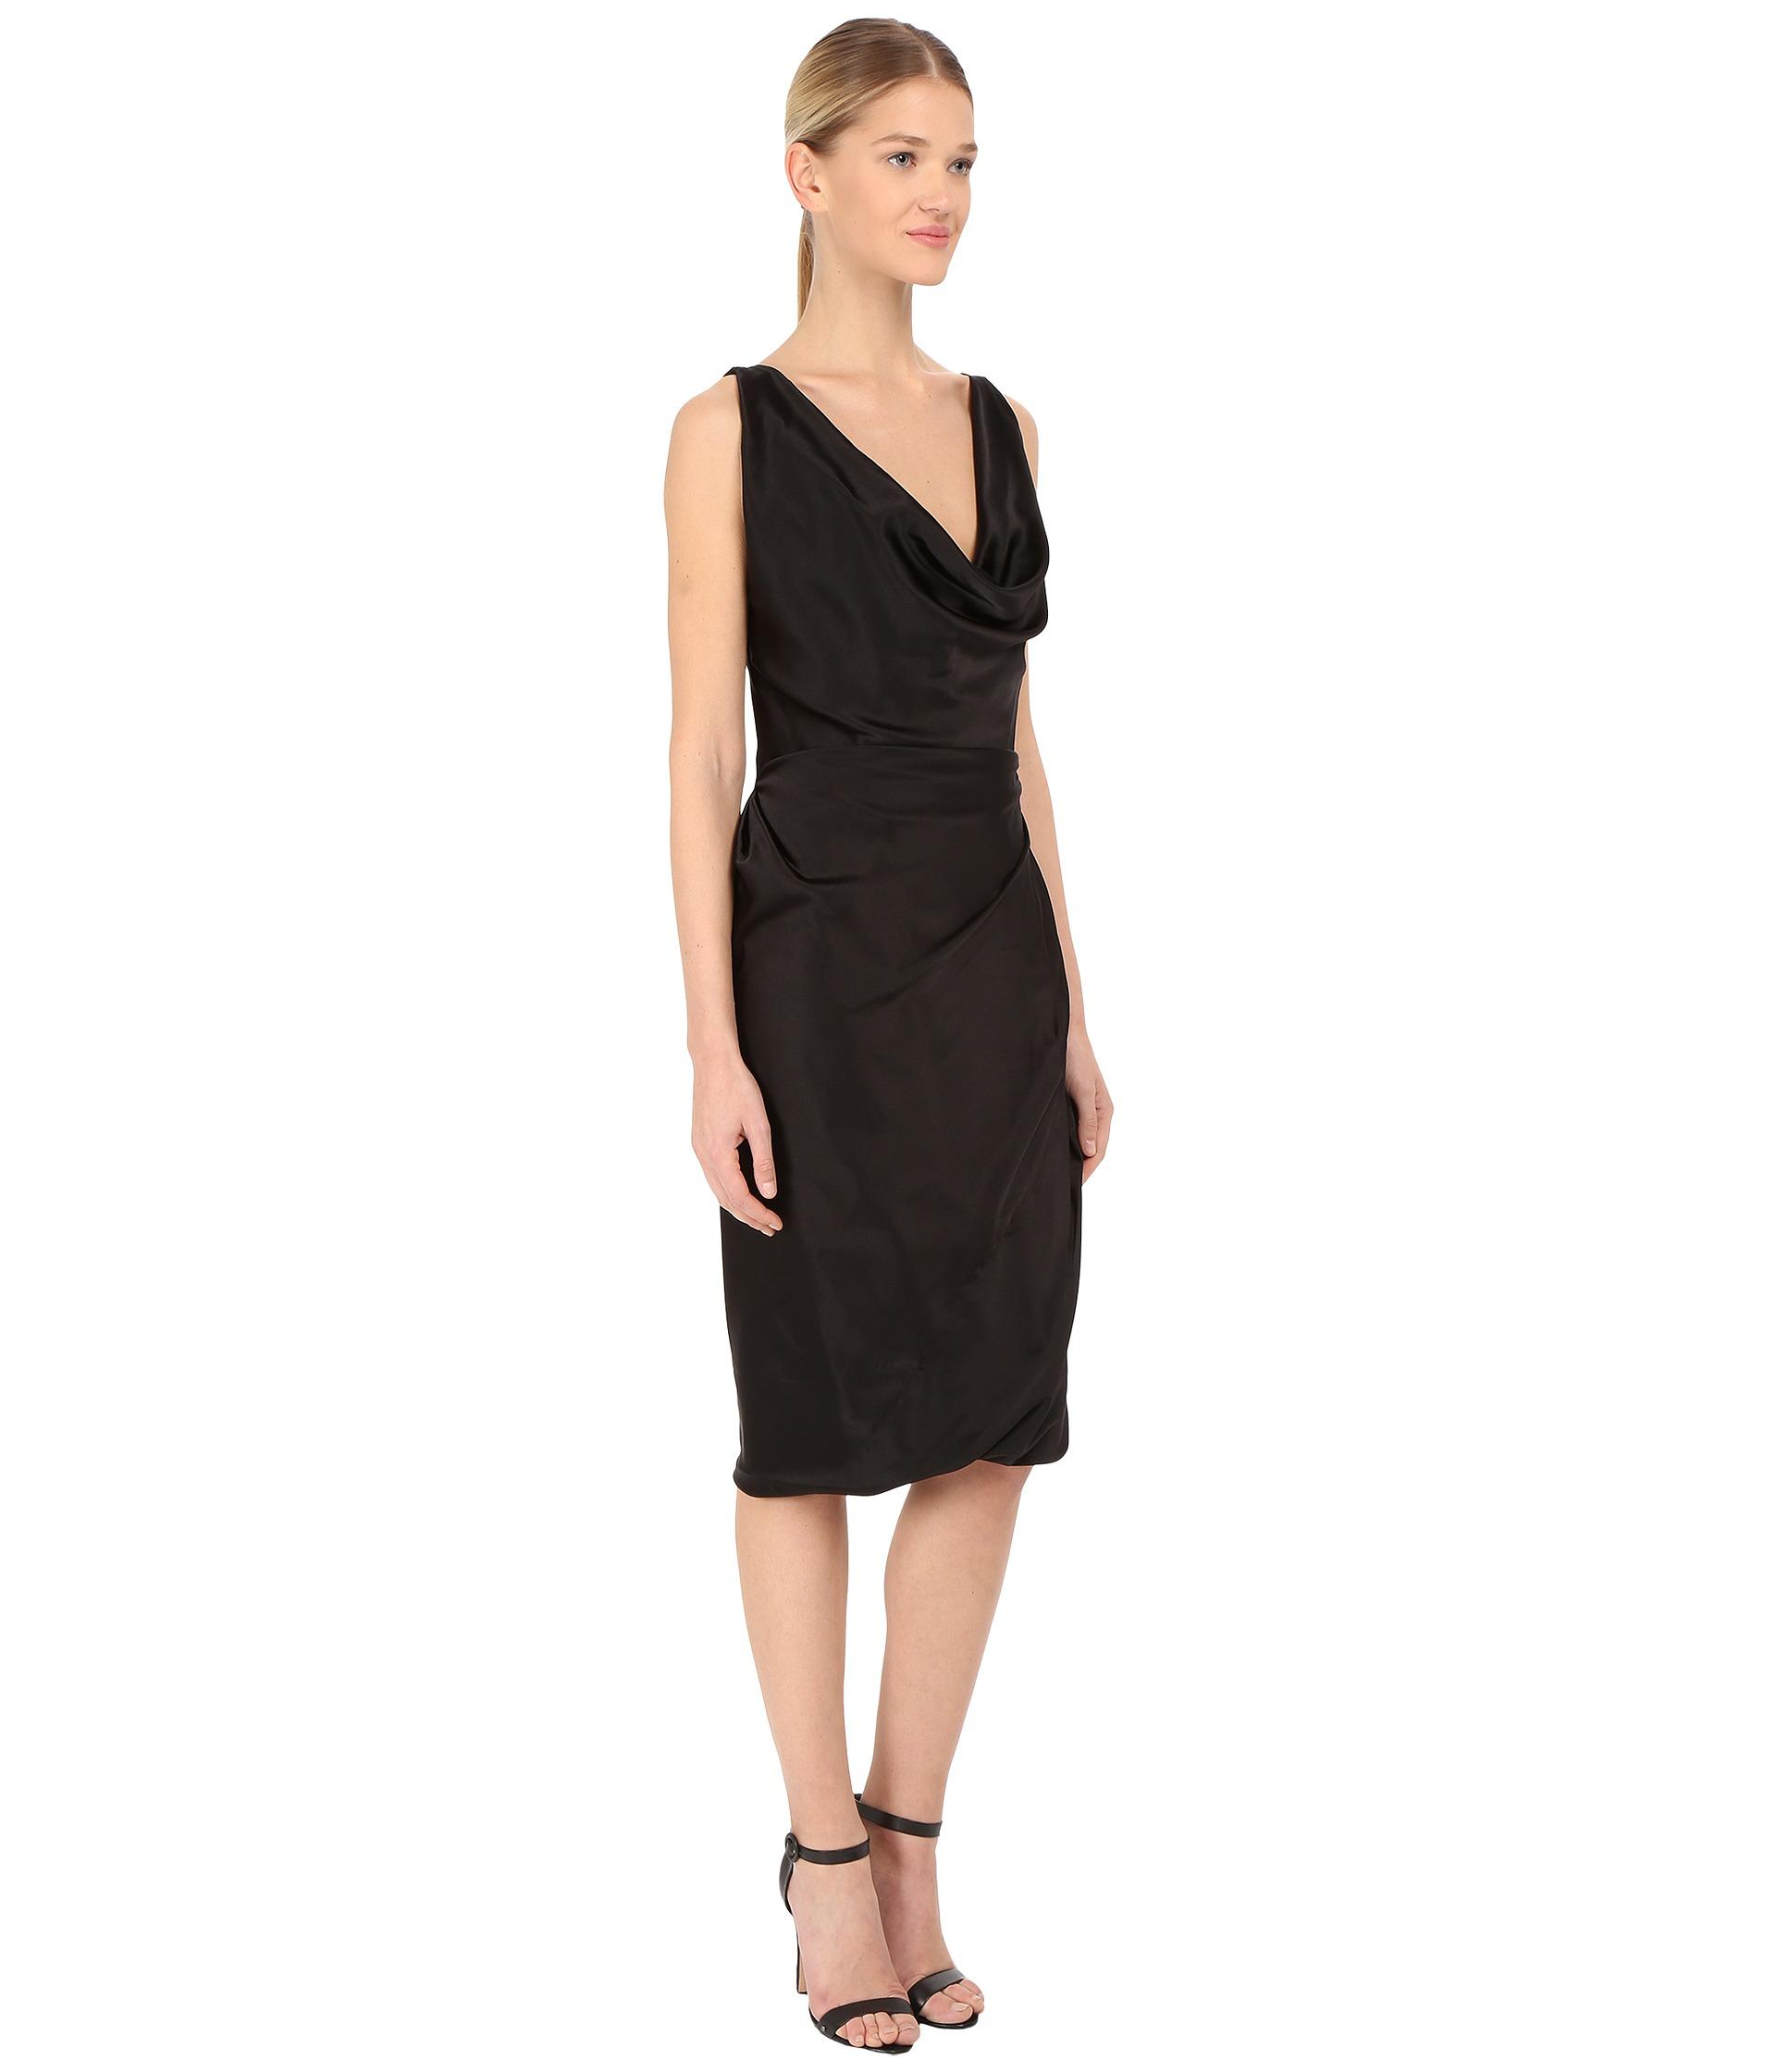 6456e93c2ed Lyst - Vivienne Westwood Red Label Stretch Satin Short Amber Dress ...